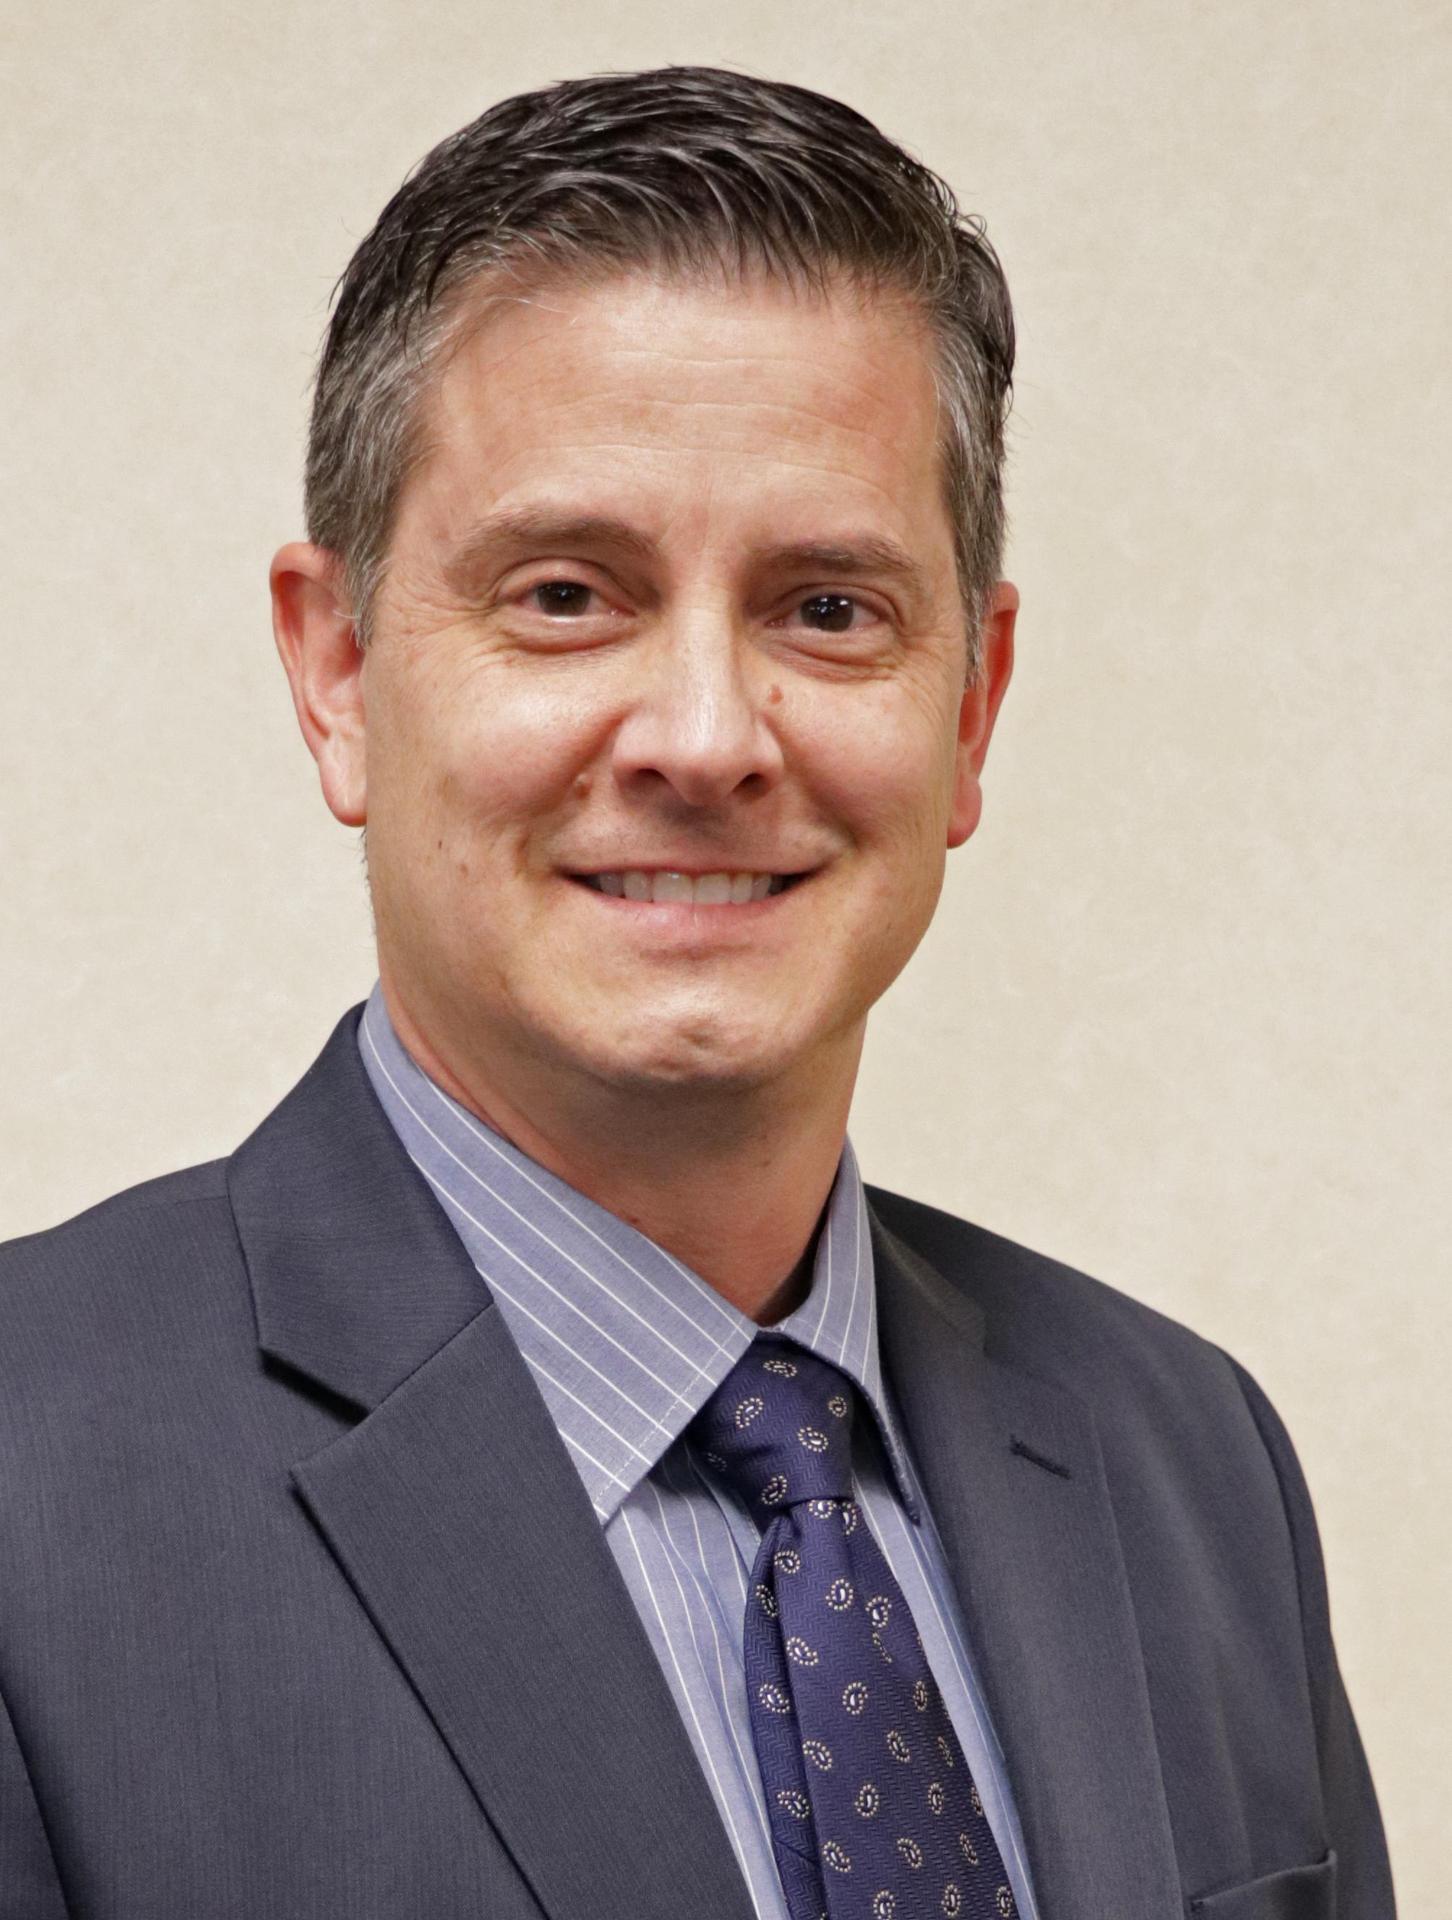 Scot Reitenour, Board Vice President